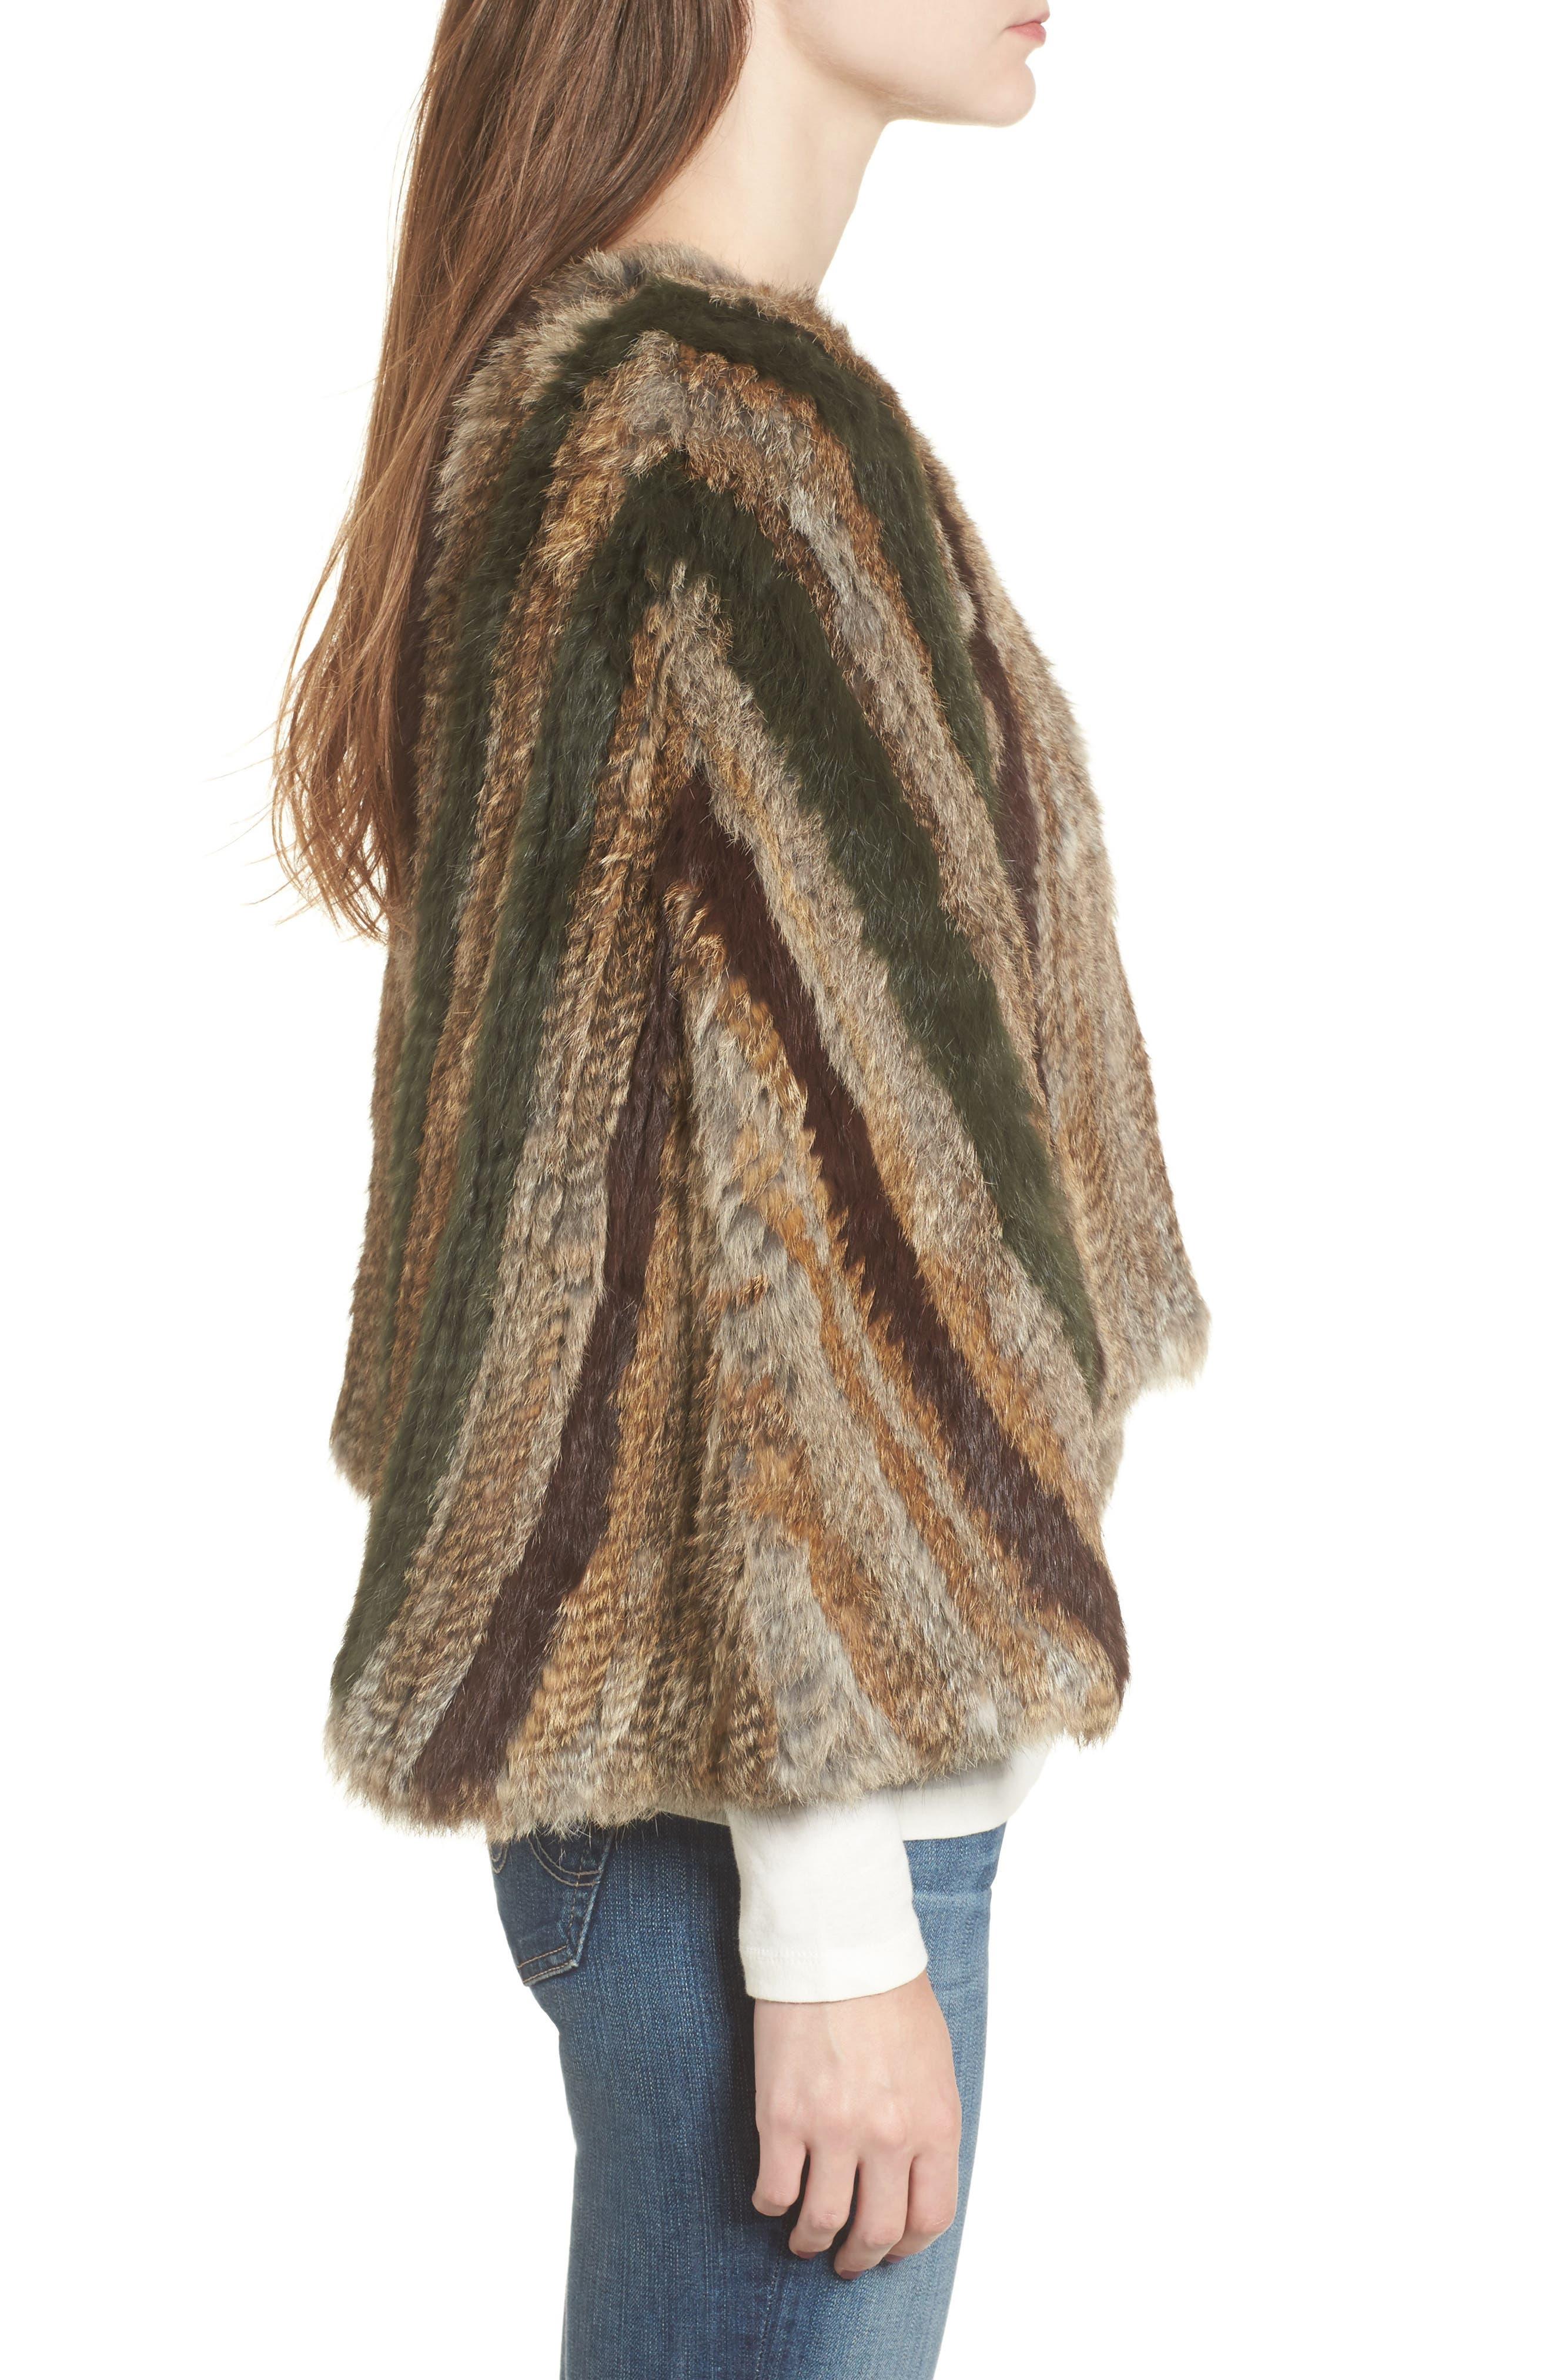 BNCI Nomad Genuine Rabbit Fur Pullover,                             Alternate thumbnail 3, color,                             208